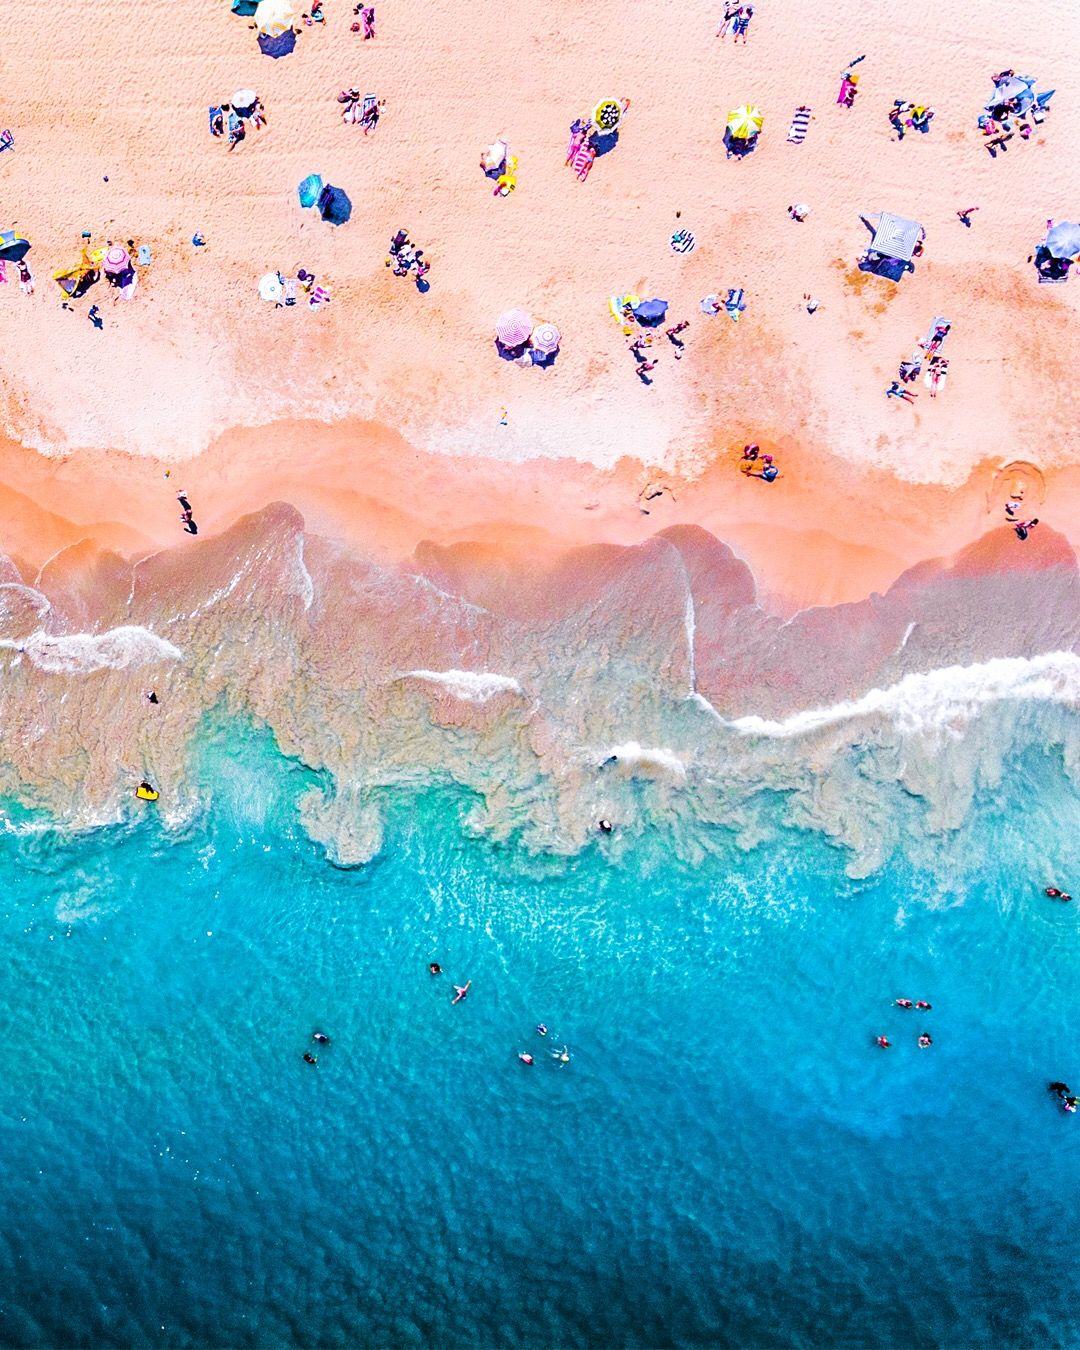 Leighton Beach, North Fremantle (Perth), Western Australia